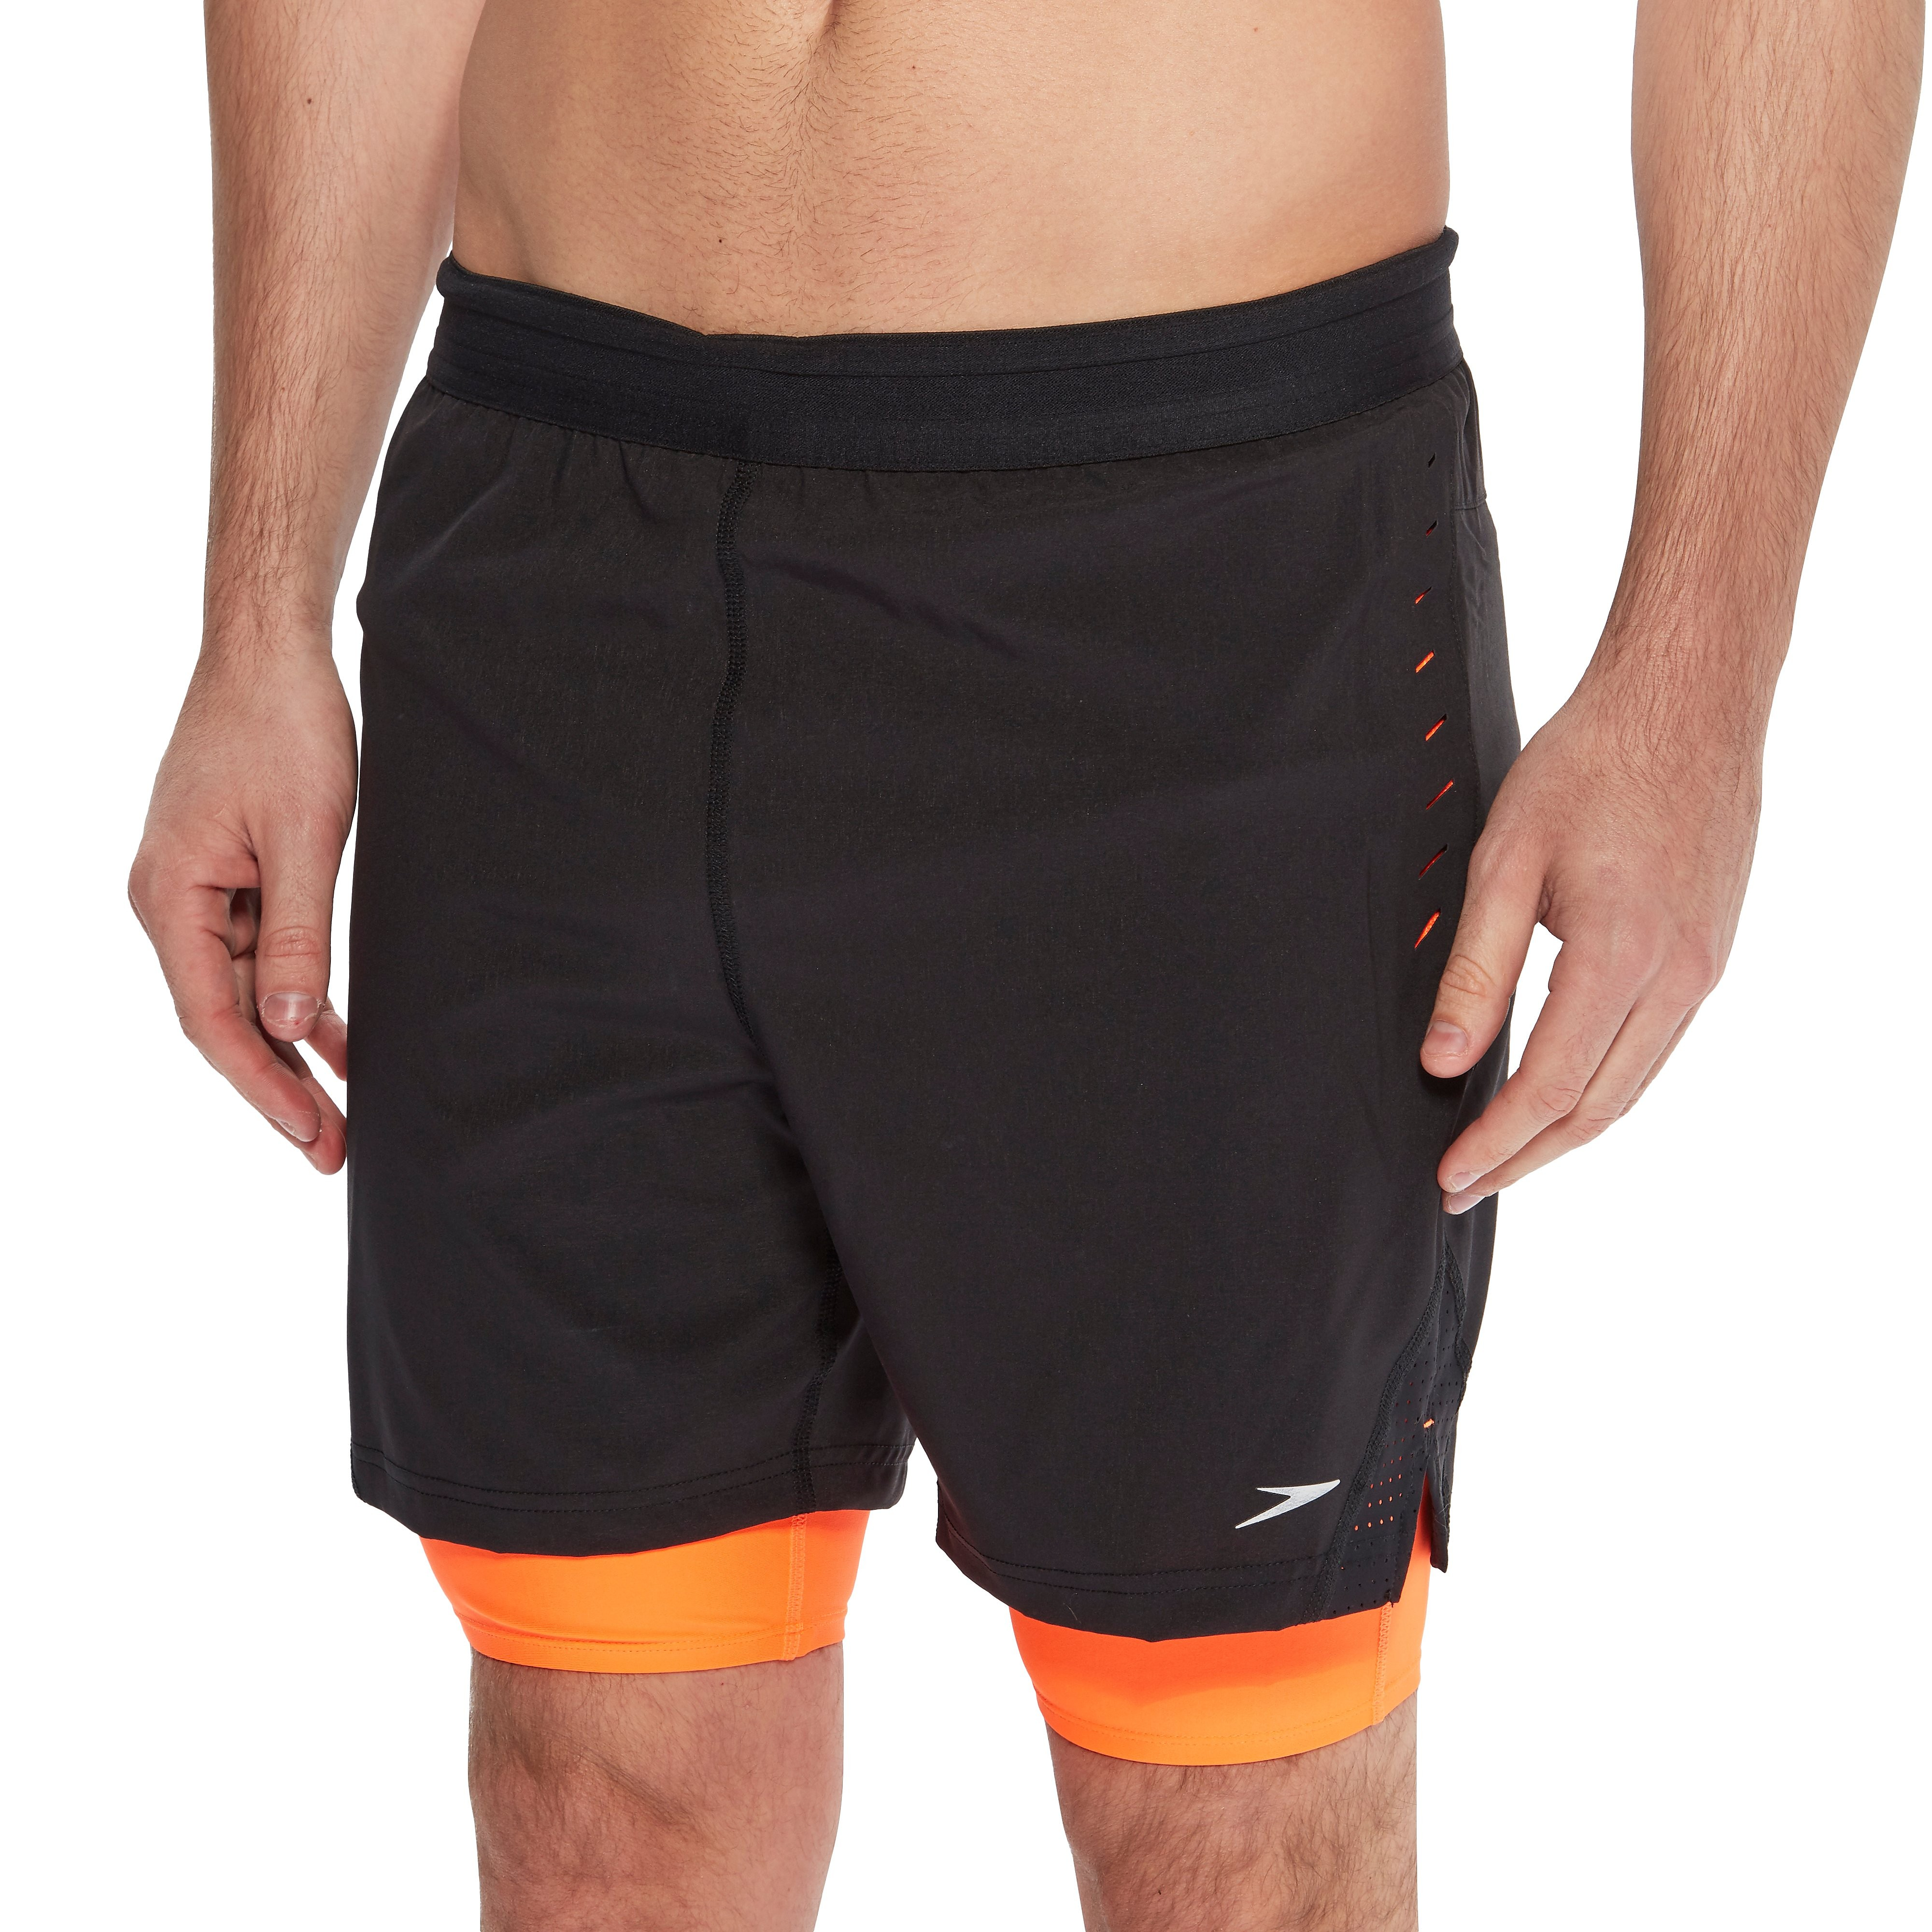 "Speedo Lane Hybrid 16"" Men's Swimming Shorts"